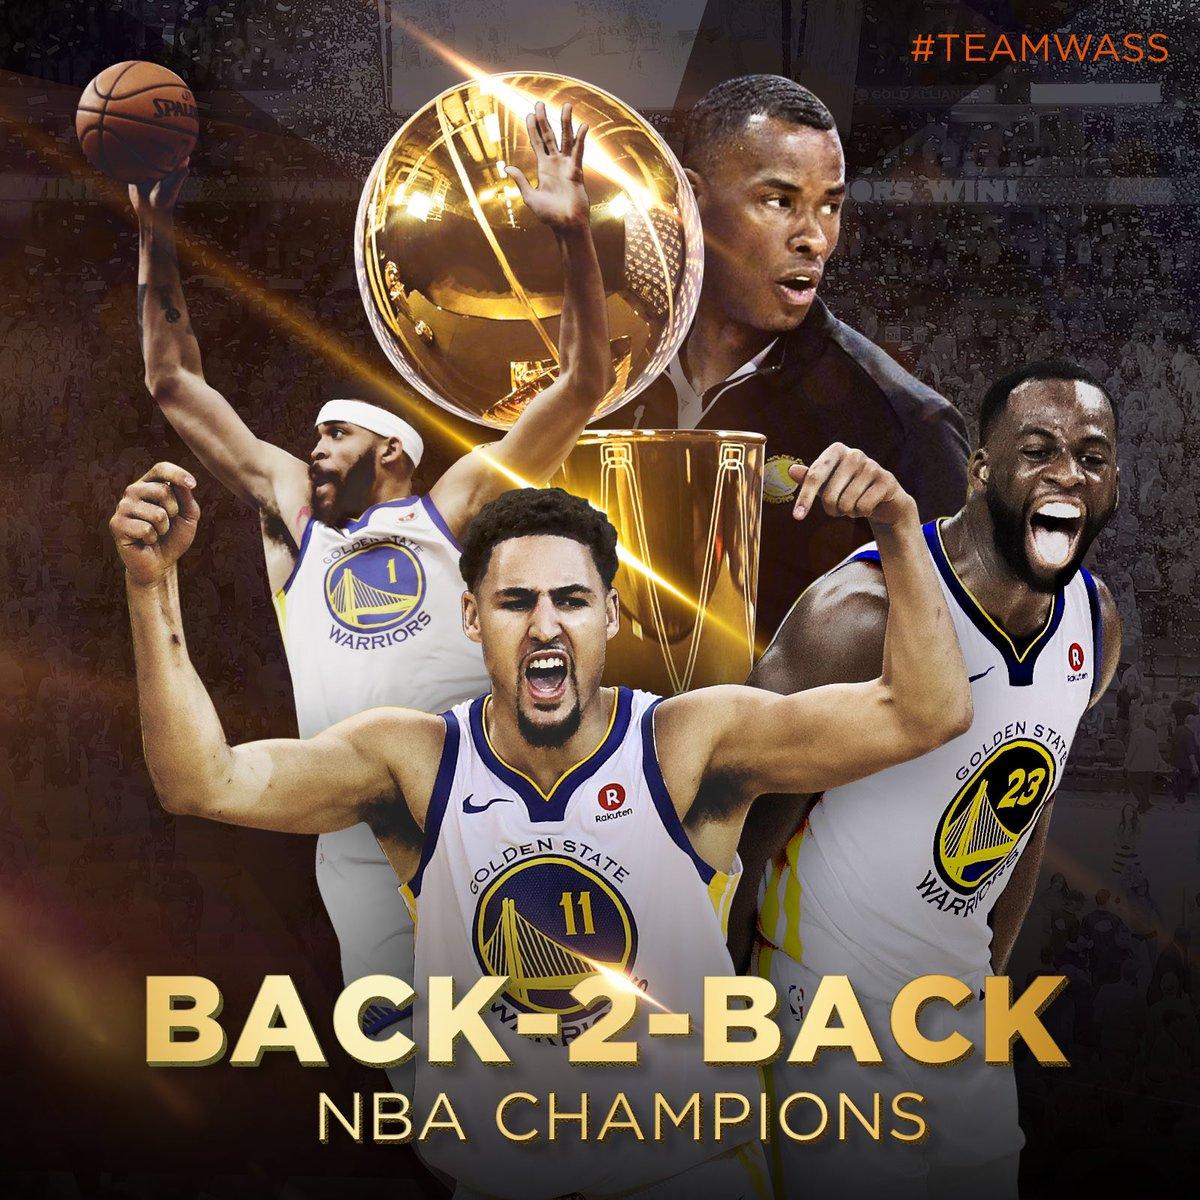 Congrats on another 🏆 Jarron, JaVale, Draymond & Klay #TeamWass